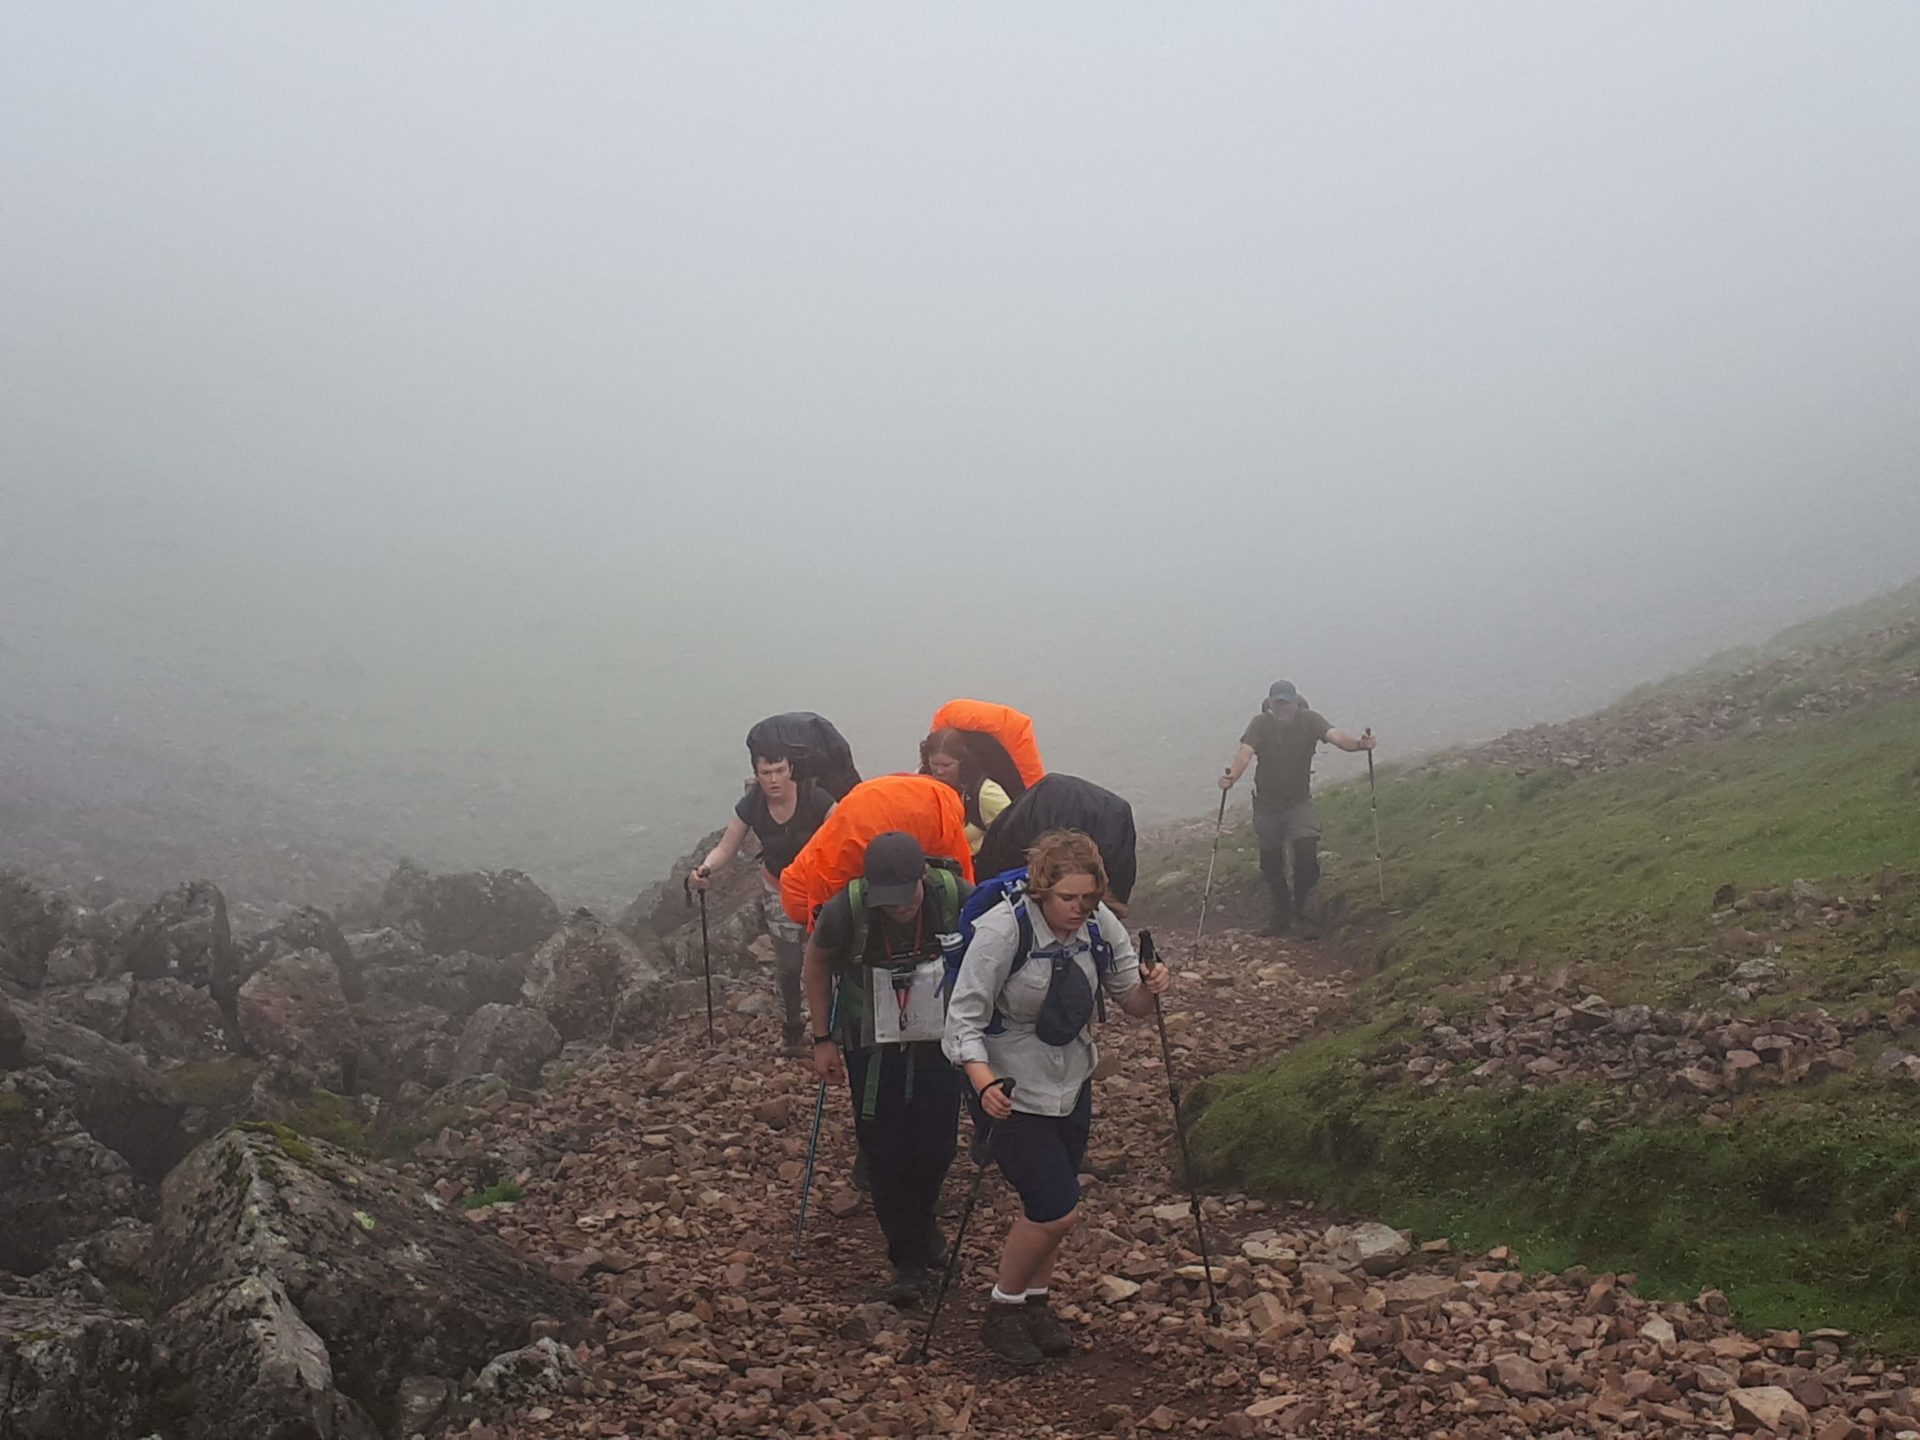 DofE Gold Award - Bright Expeditions